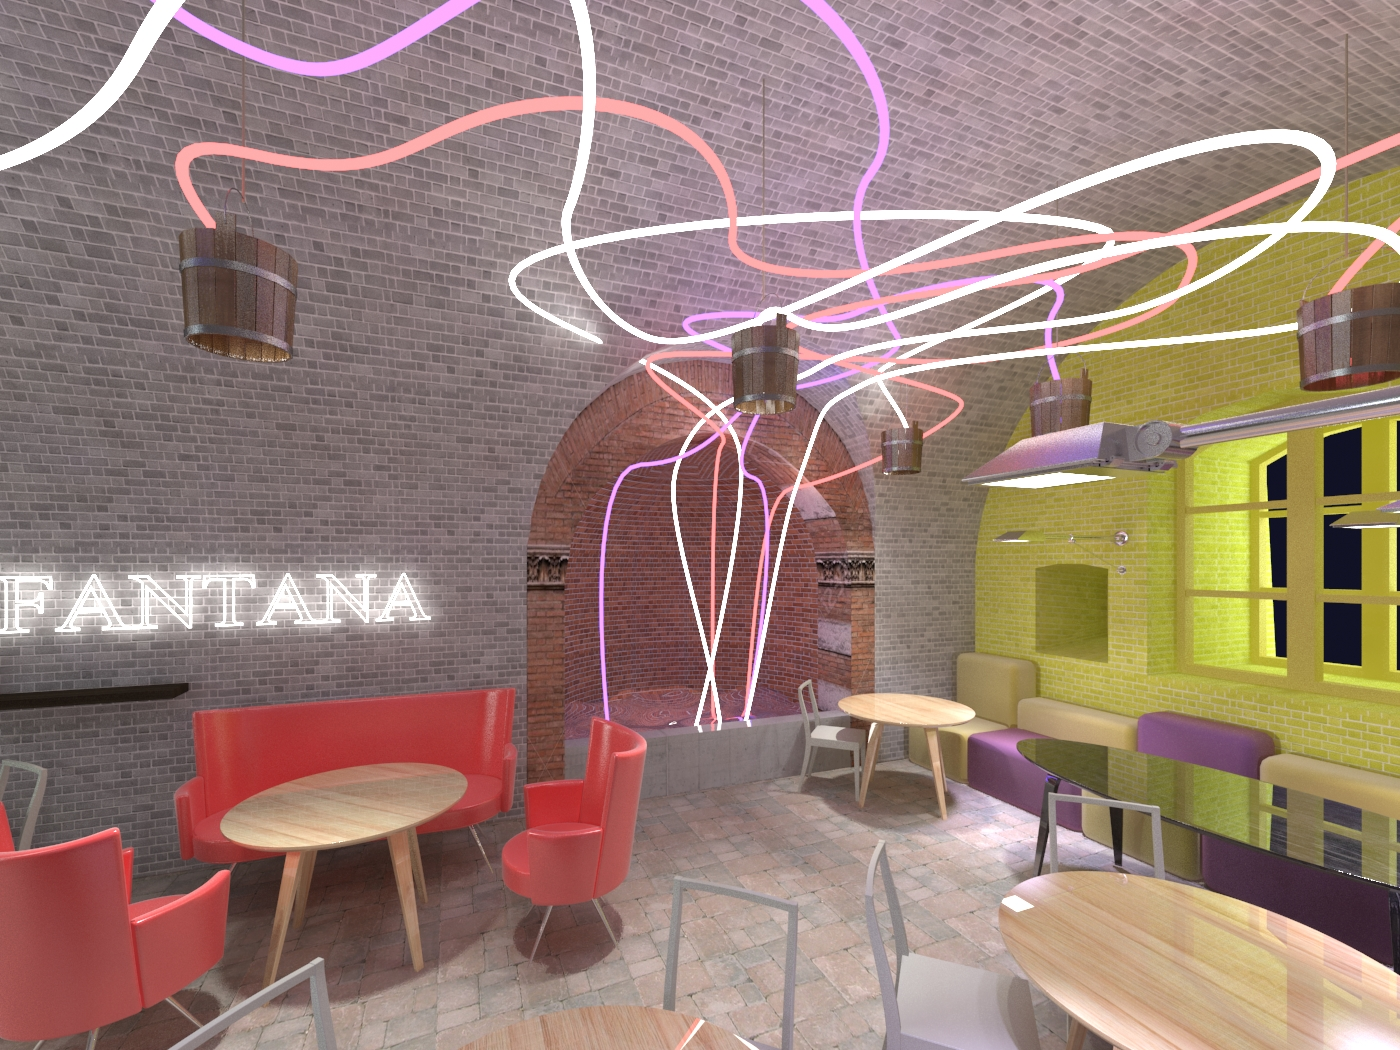 https://nbc-arhitect.ro/wp-content/uploads/2020/10/NBC-Arhitect-_-Ryma-Club-_-Alba-Iulia-Romania-_-interior-design-view_1.jpg